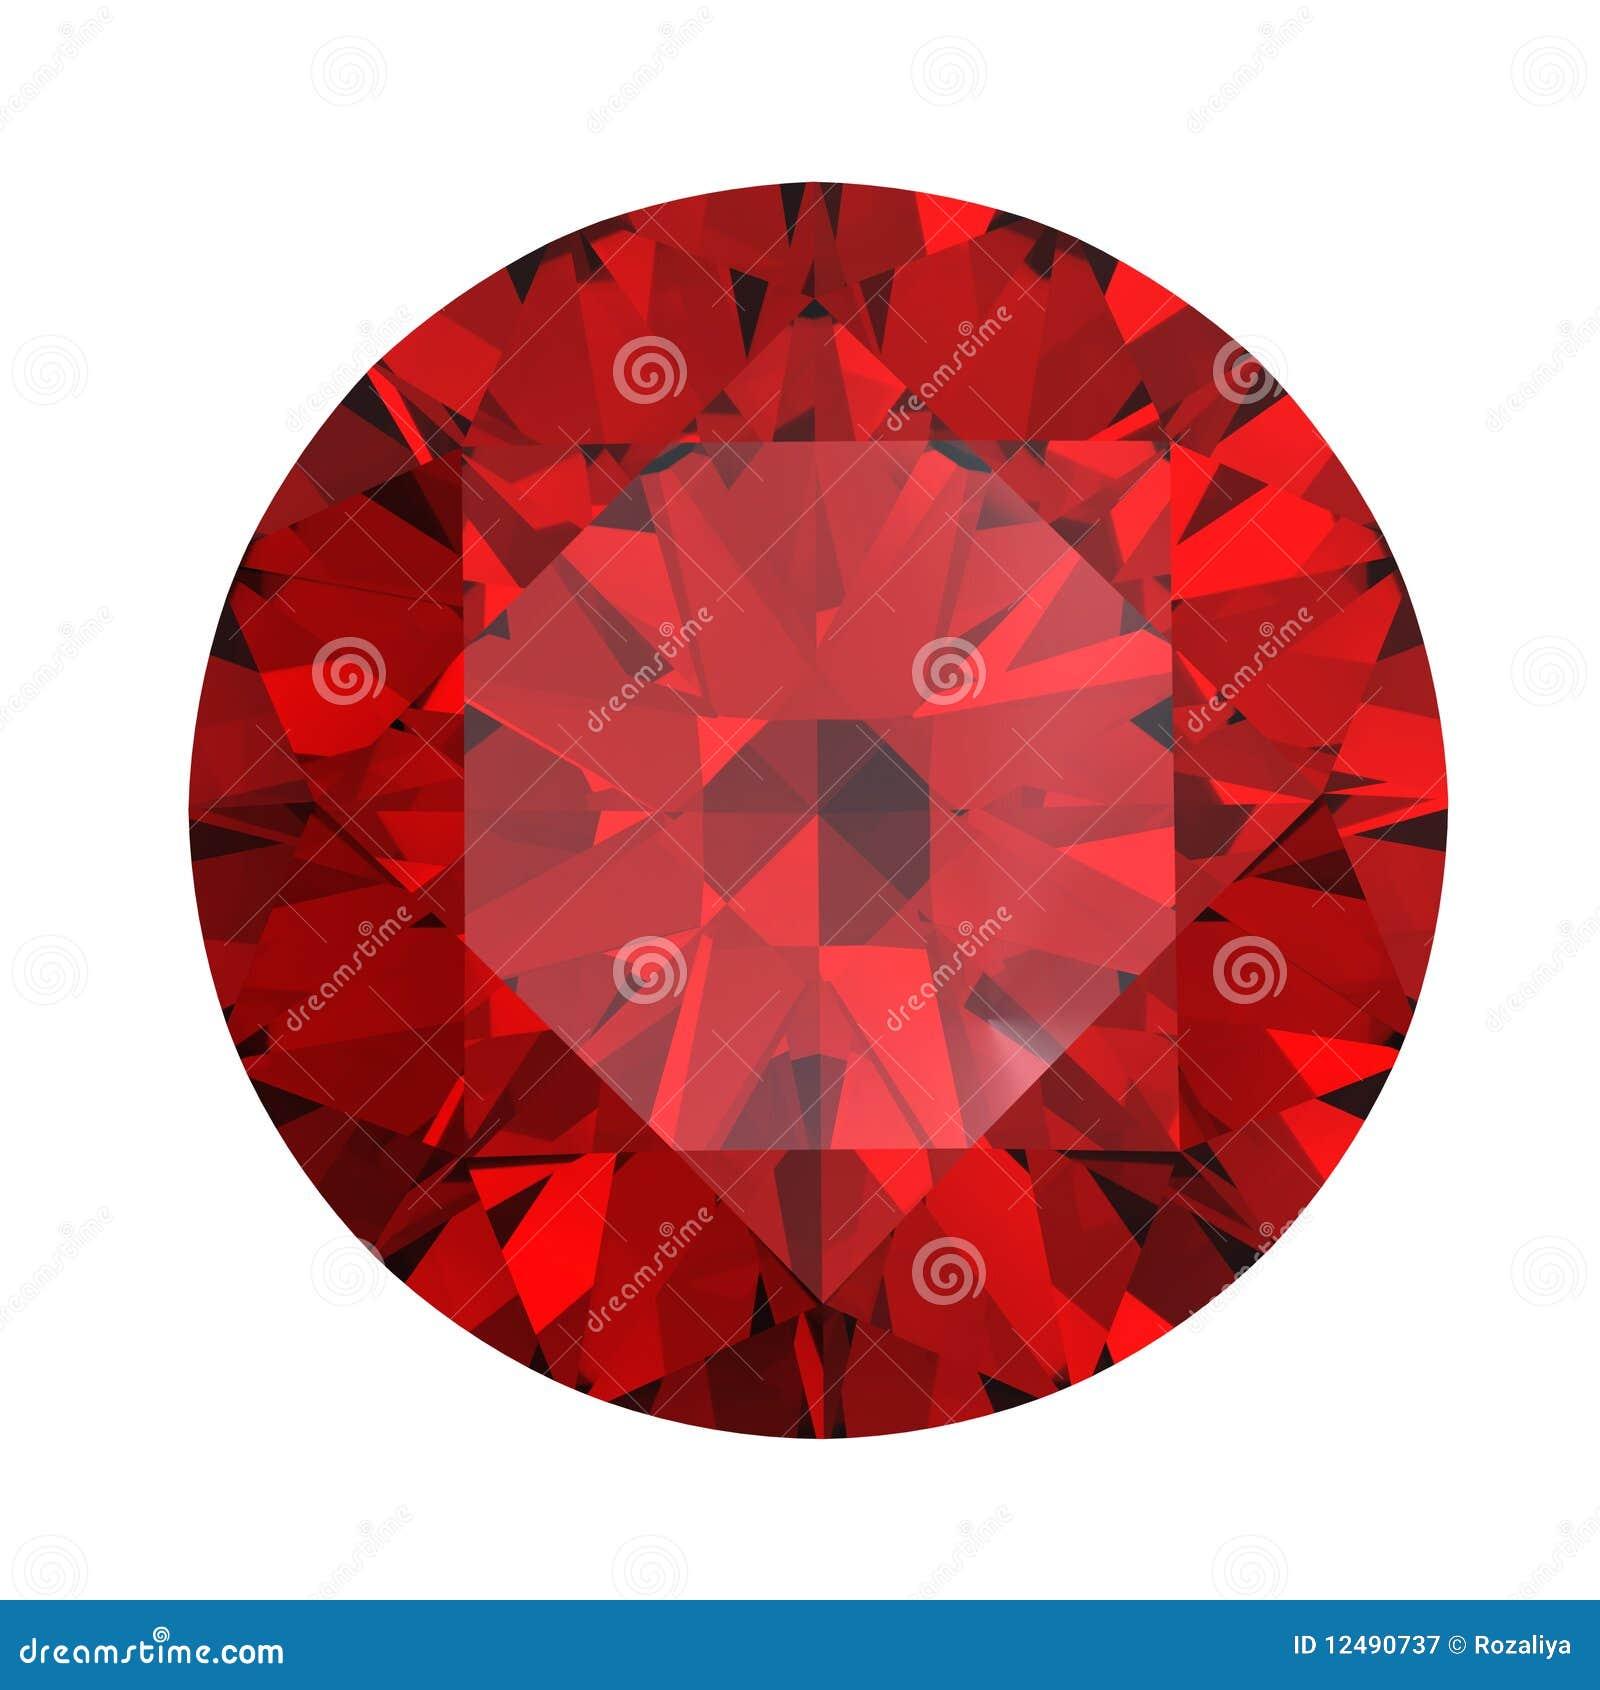 diamond heart clipart